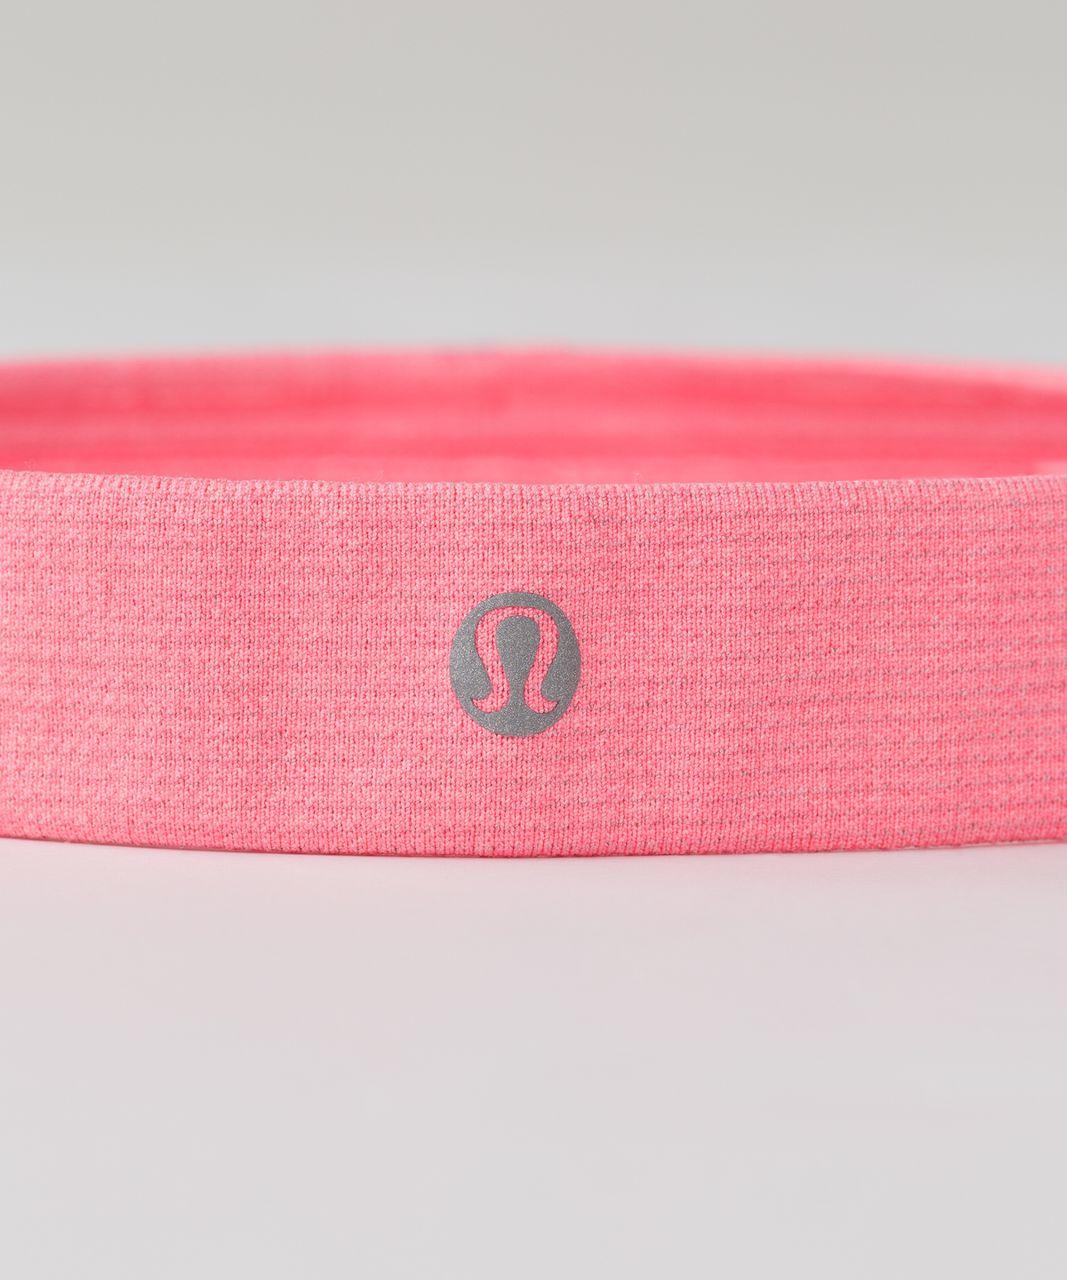 Lululemon Cardio Cross Trainer Headband - Heathered Electric Coral